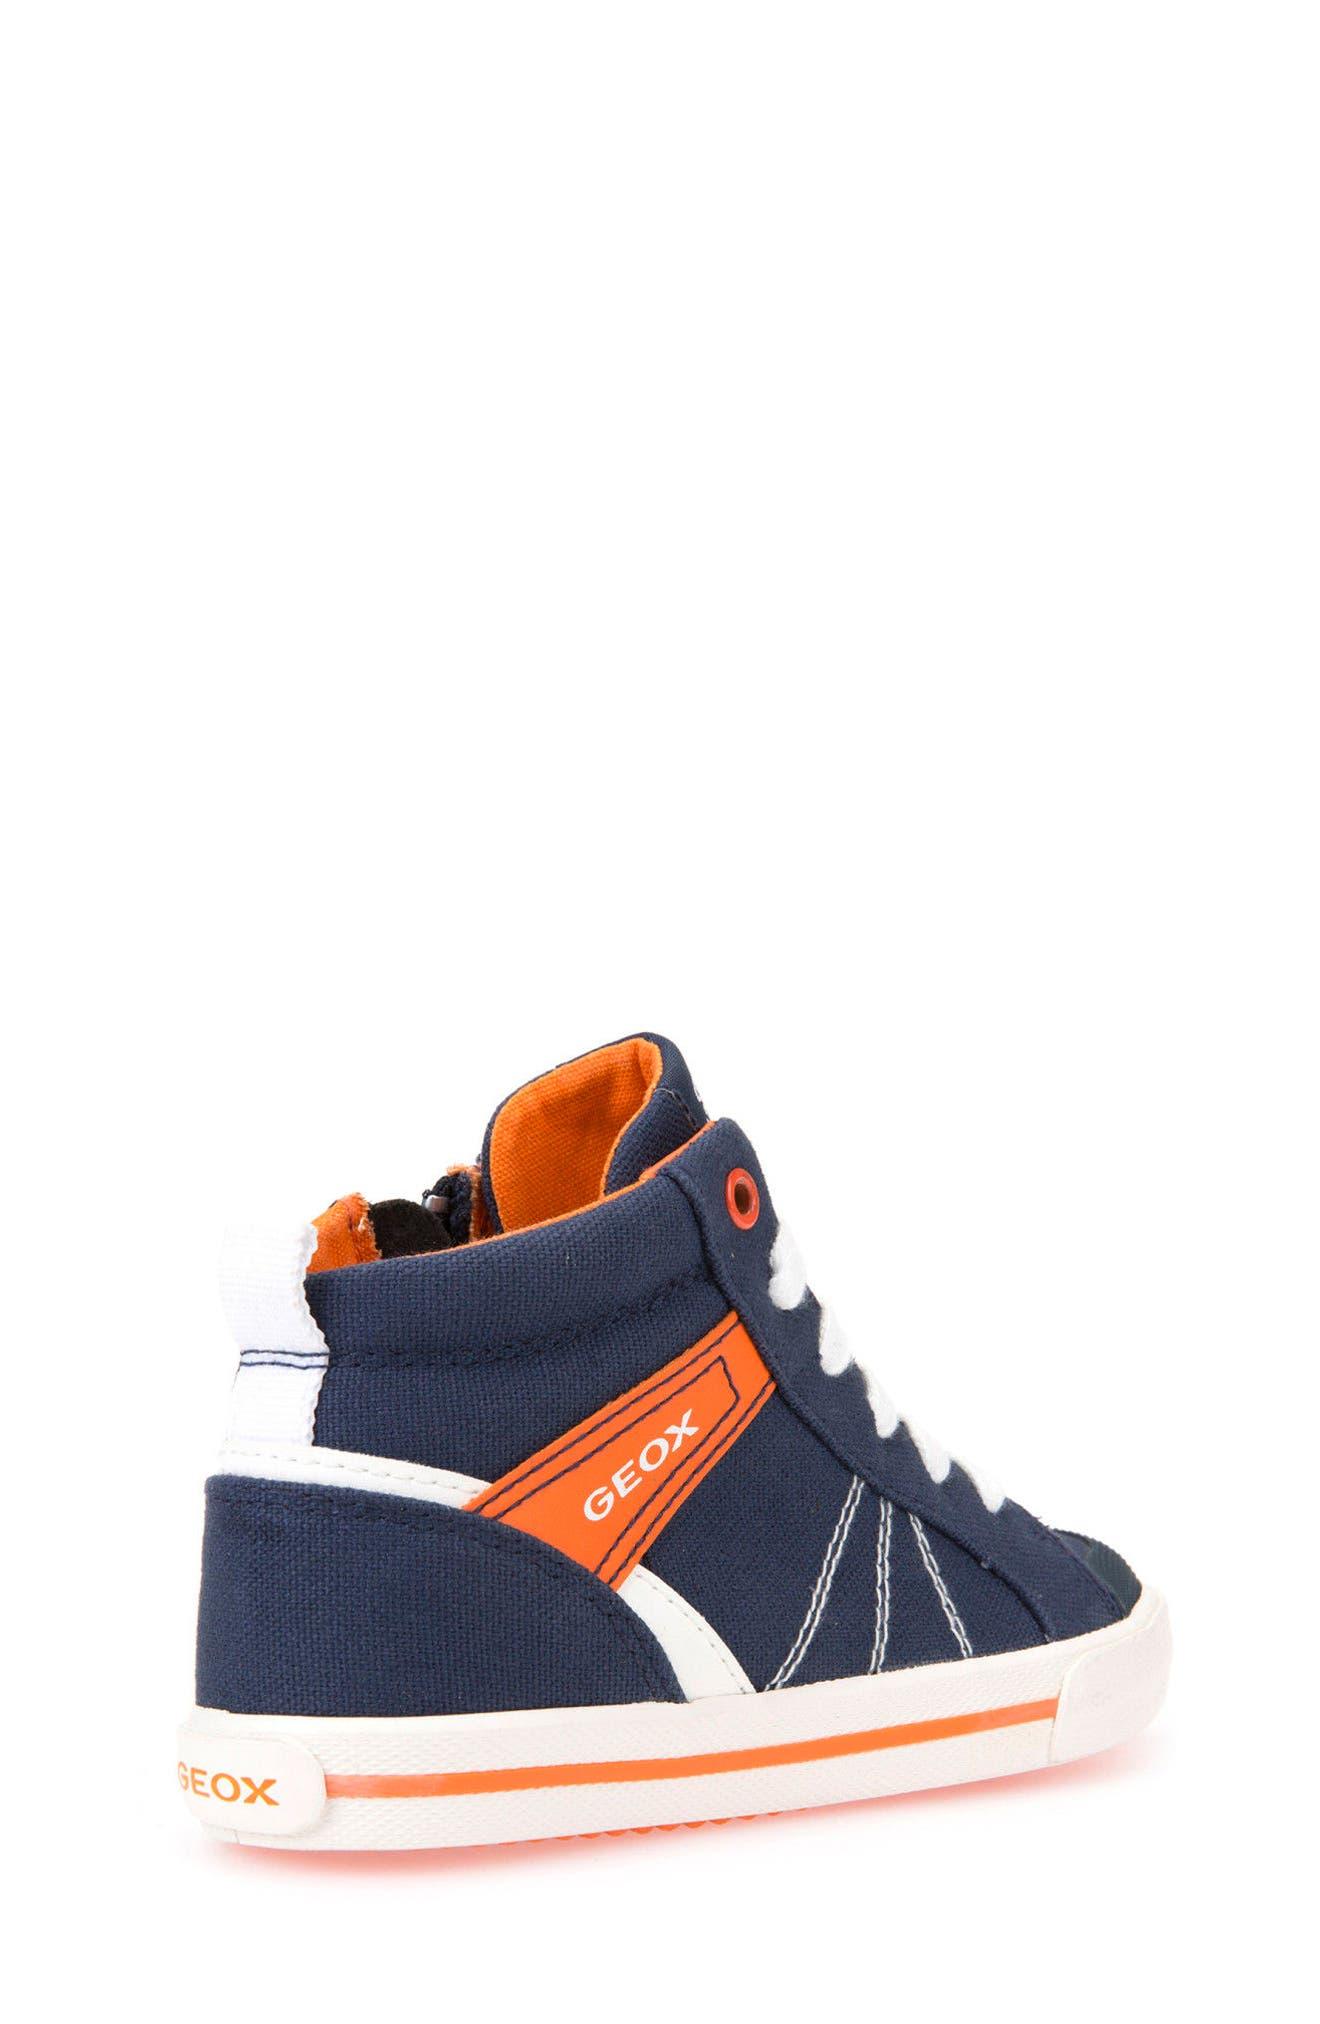 Kilwi Zip High Top Sneaker,                             Alternate thumbnail 2, color,                             402